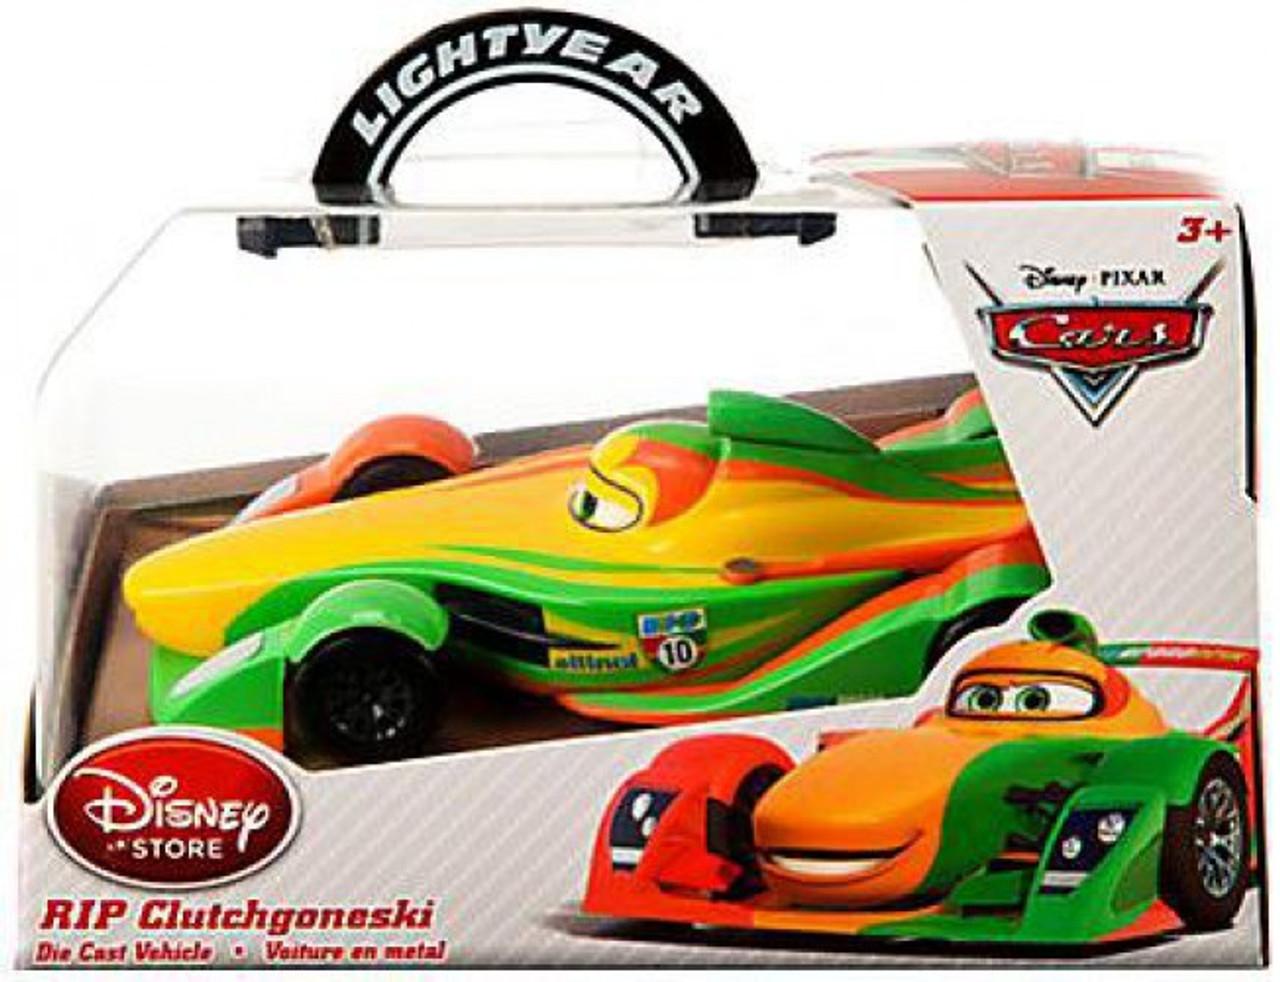 Disney Cars 1:43 Lightyear Rip Clutchgoneski Exclusive Diecast Car